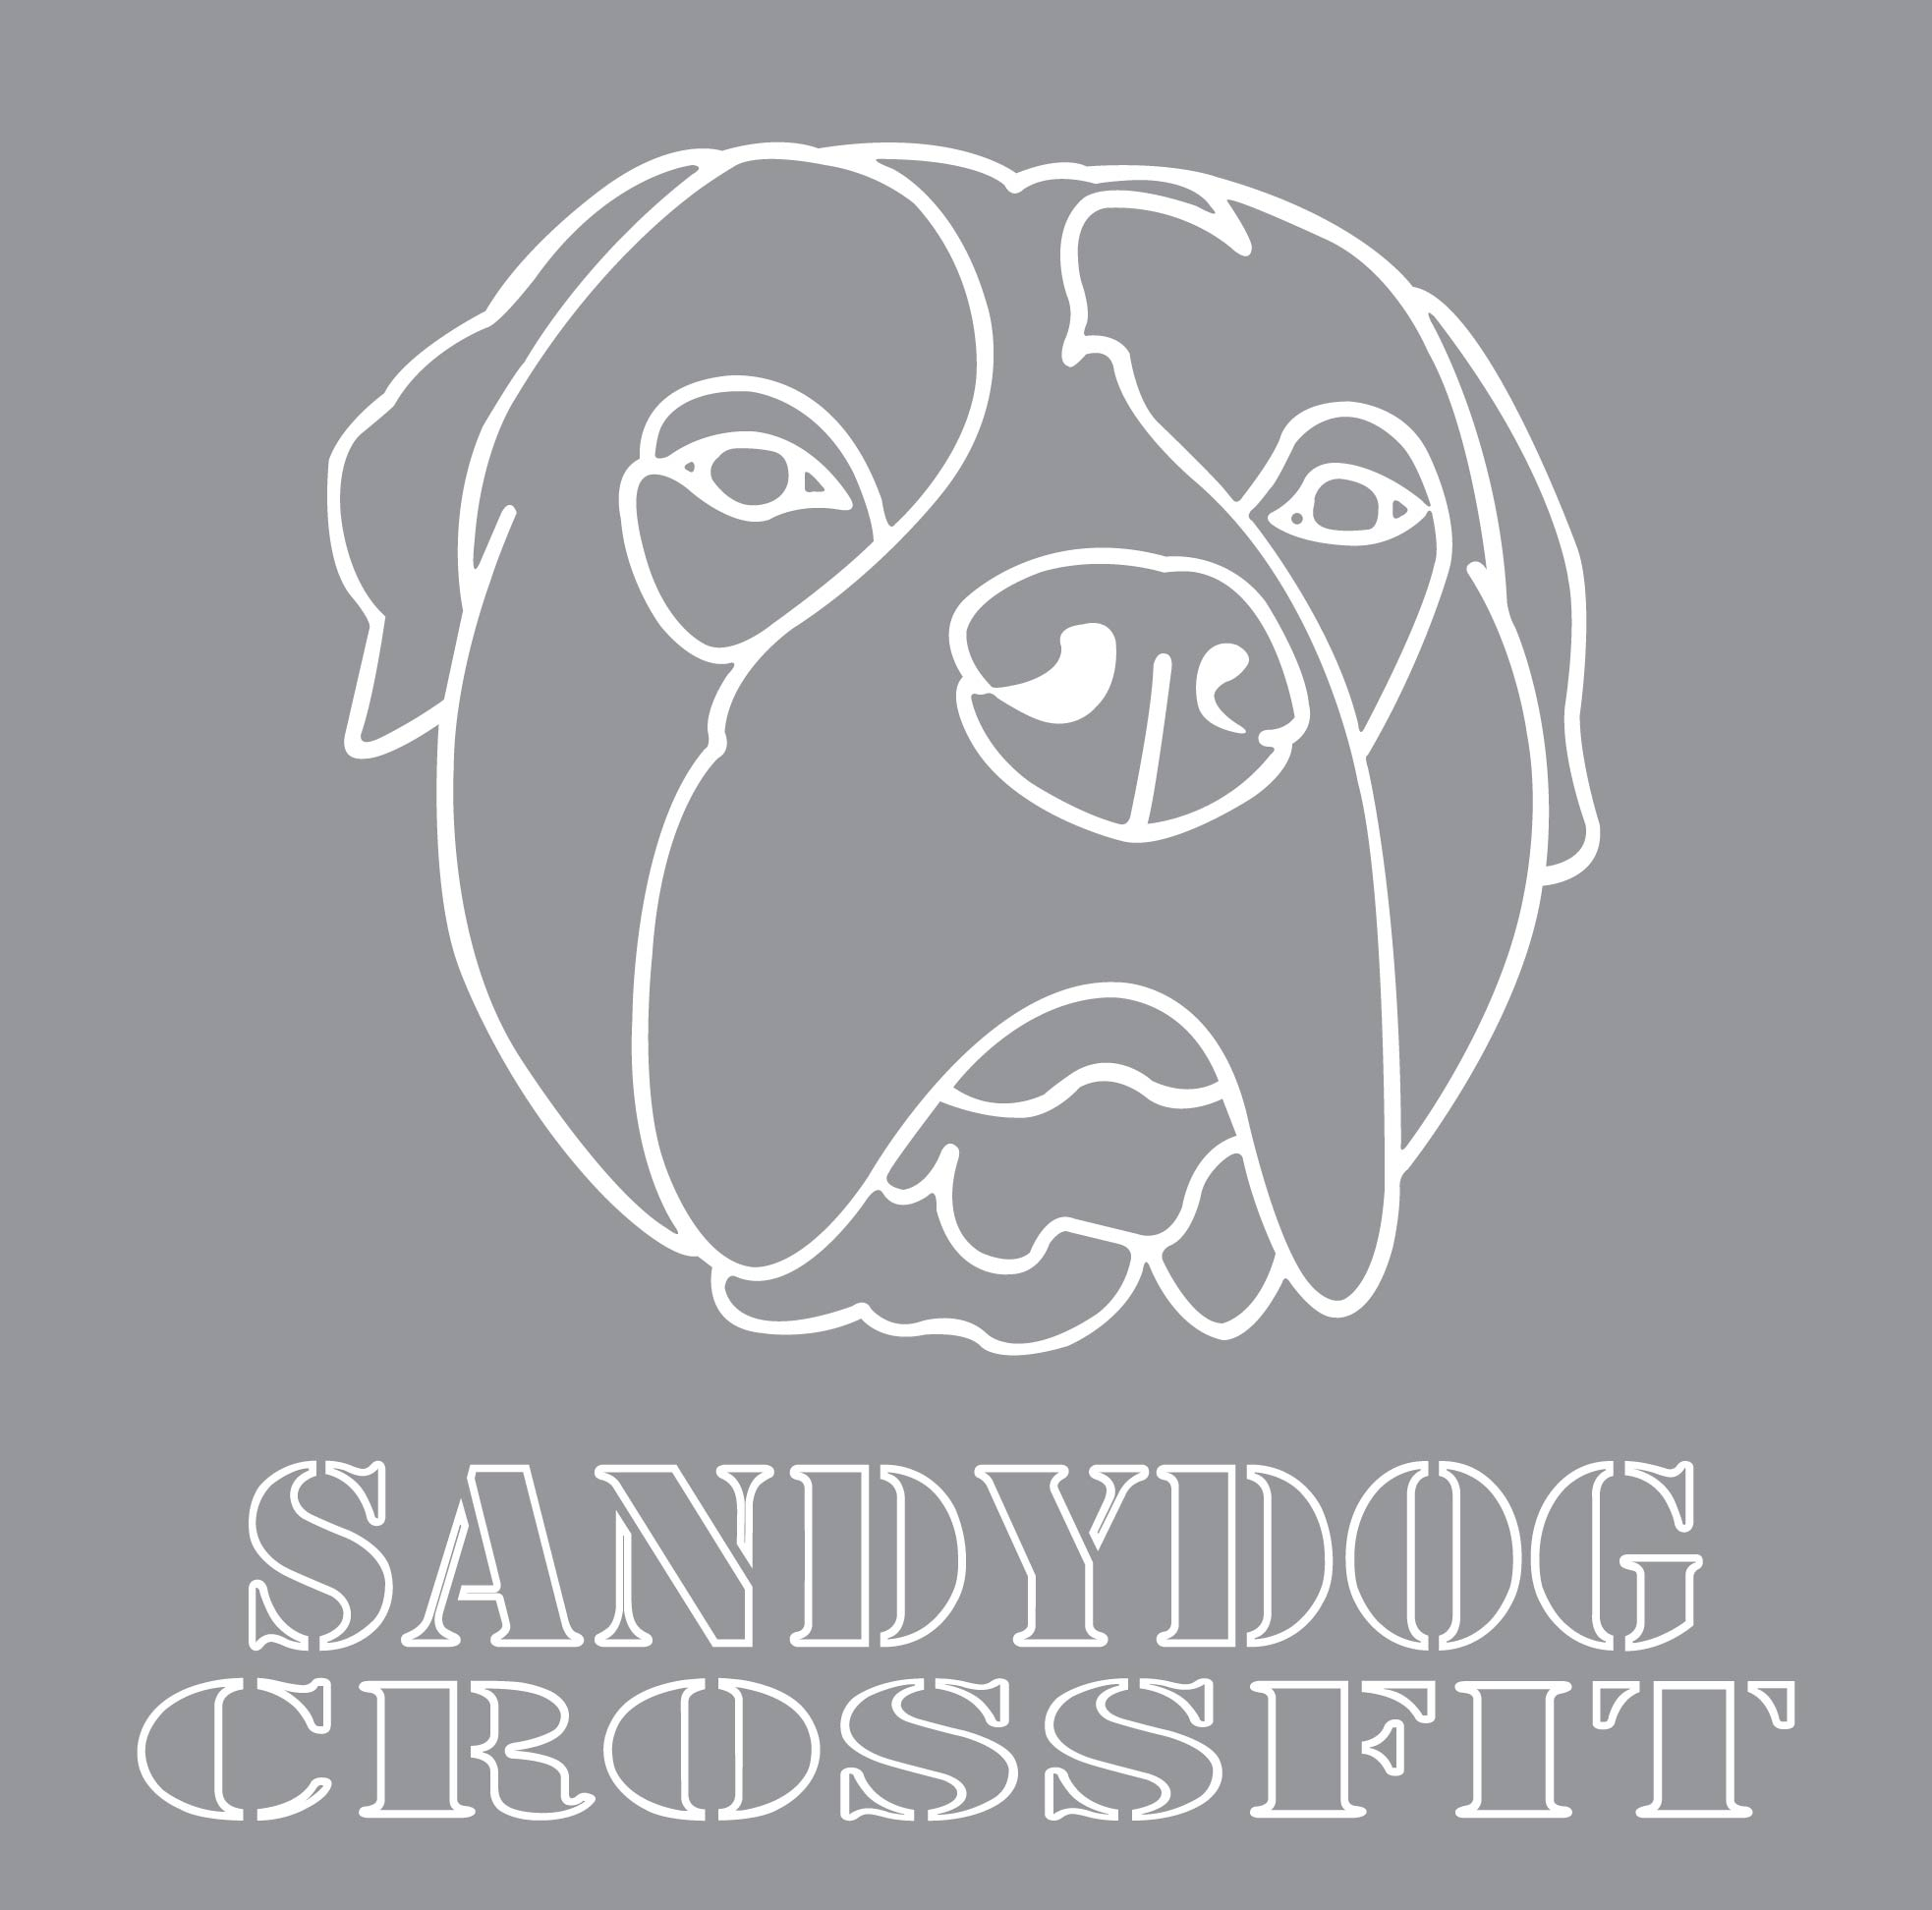 Sandy Dog Crossfit print